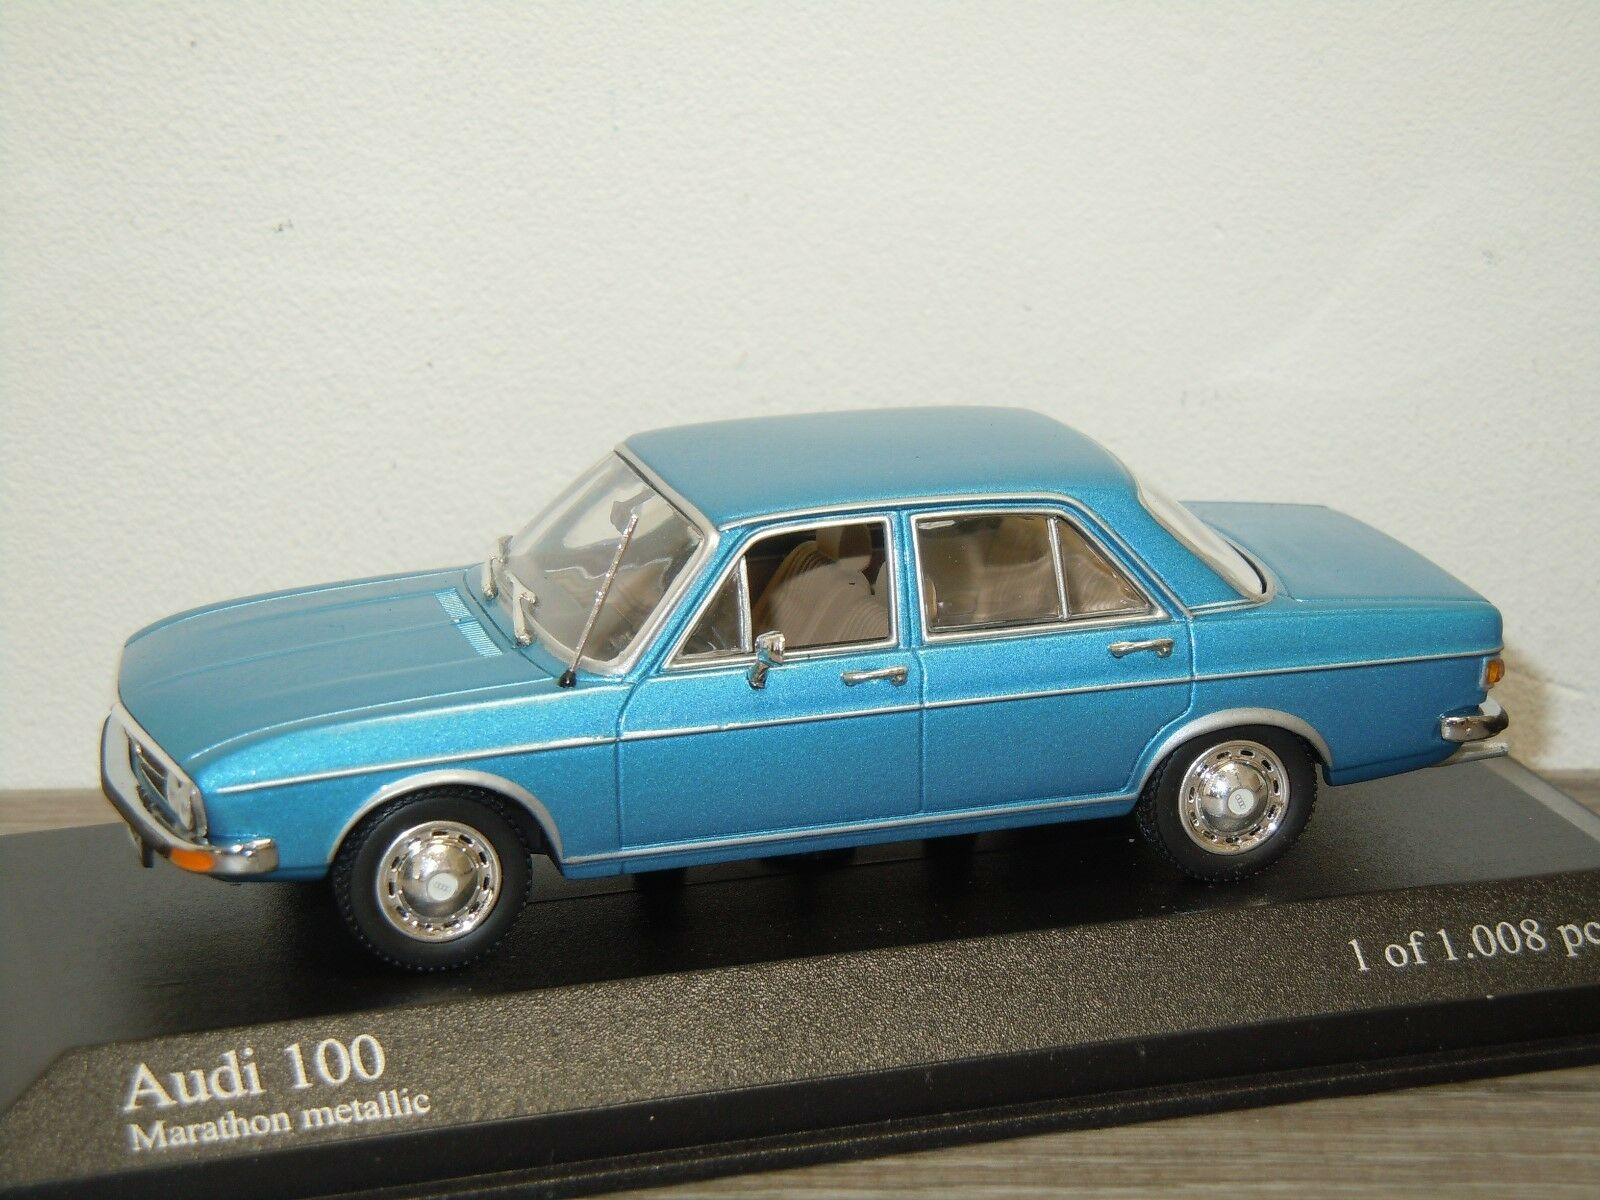 Audi 100 salon 1969  75 - minichamps 1 43 in kasten  34173